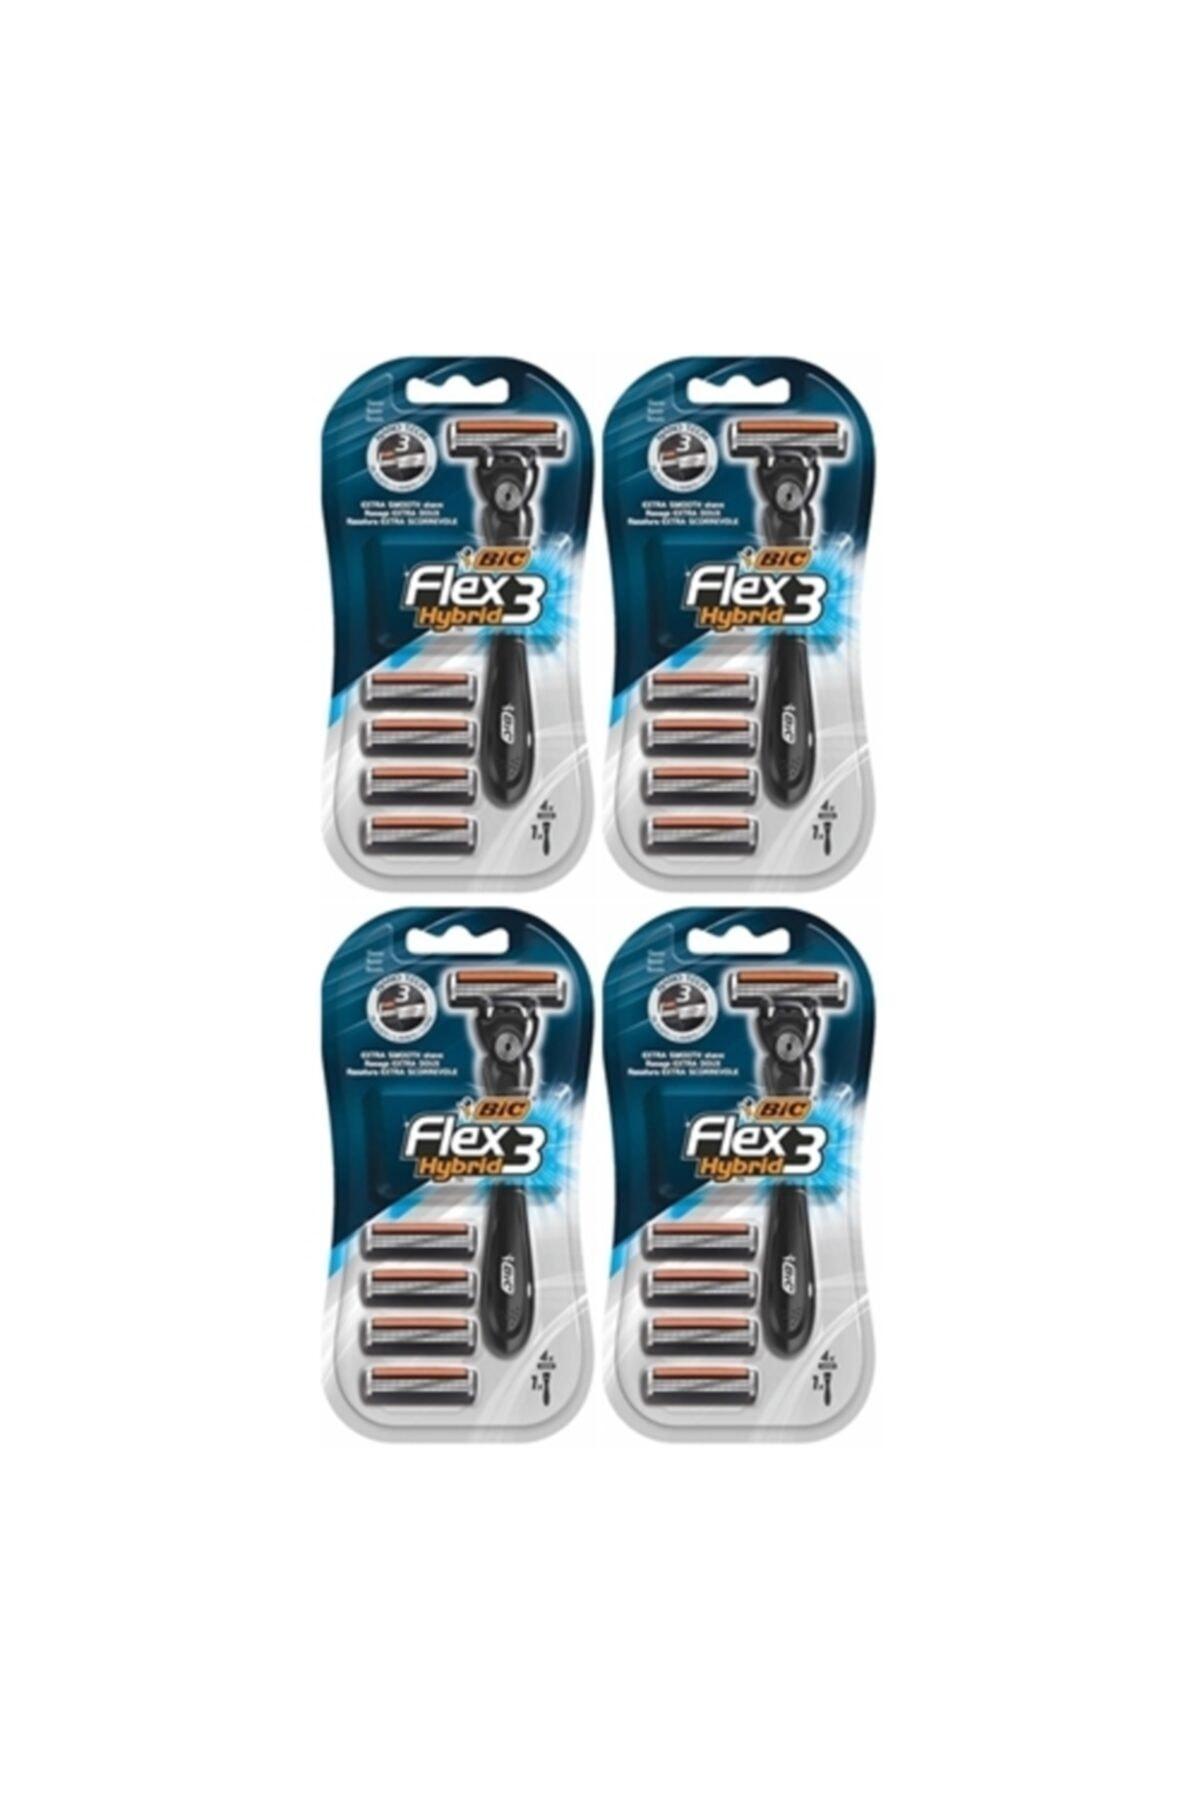 Bic Flex3 Hybrid Tıraş Bıçağı 4 Yedek 1 Sap X 4 Adet 1